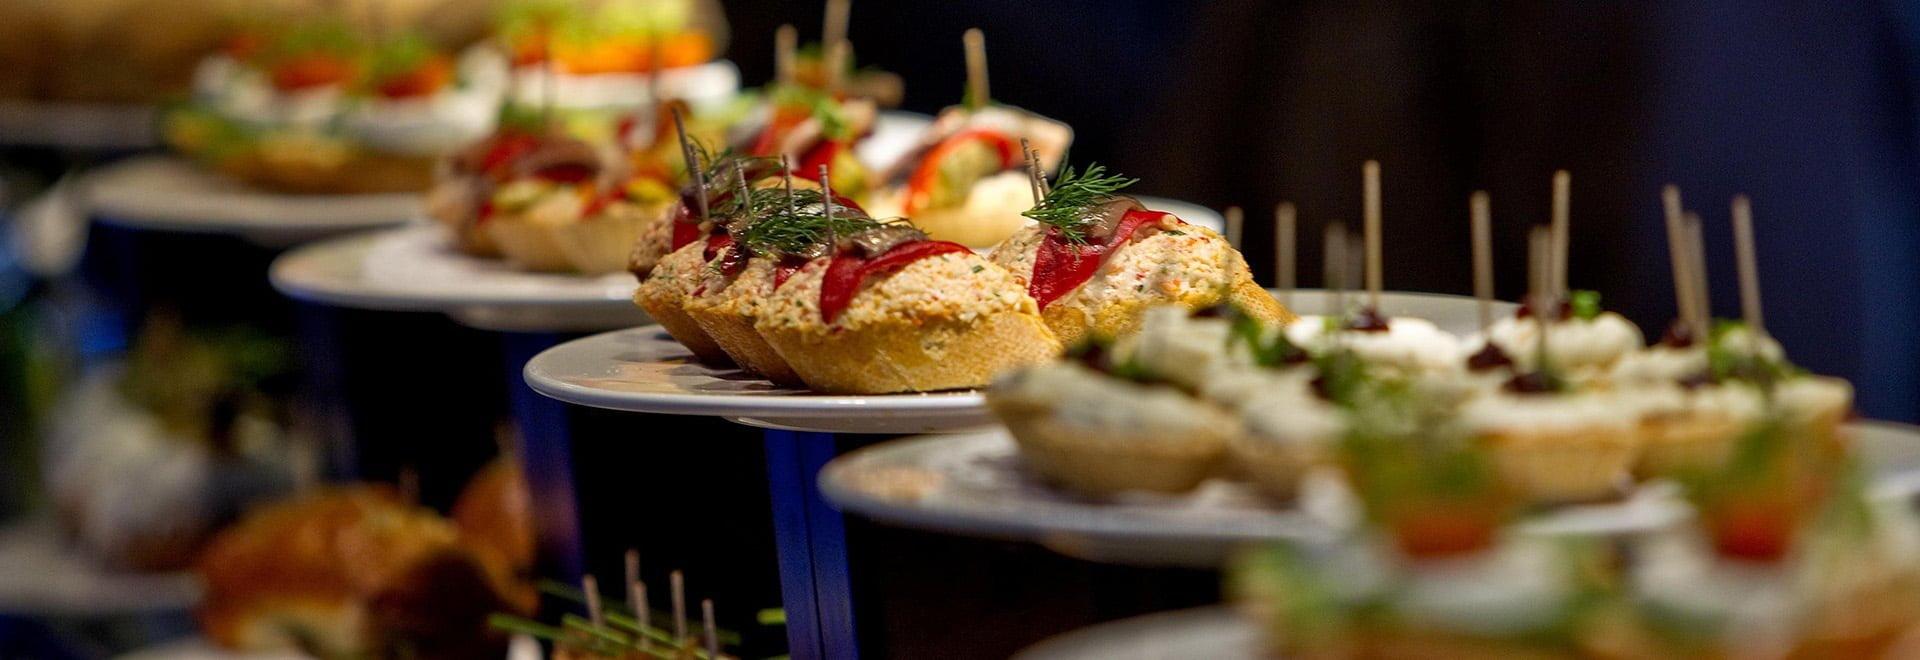 Gastronomia - Cabecera - kanala